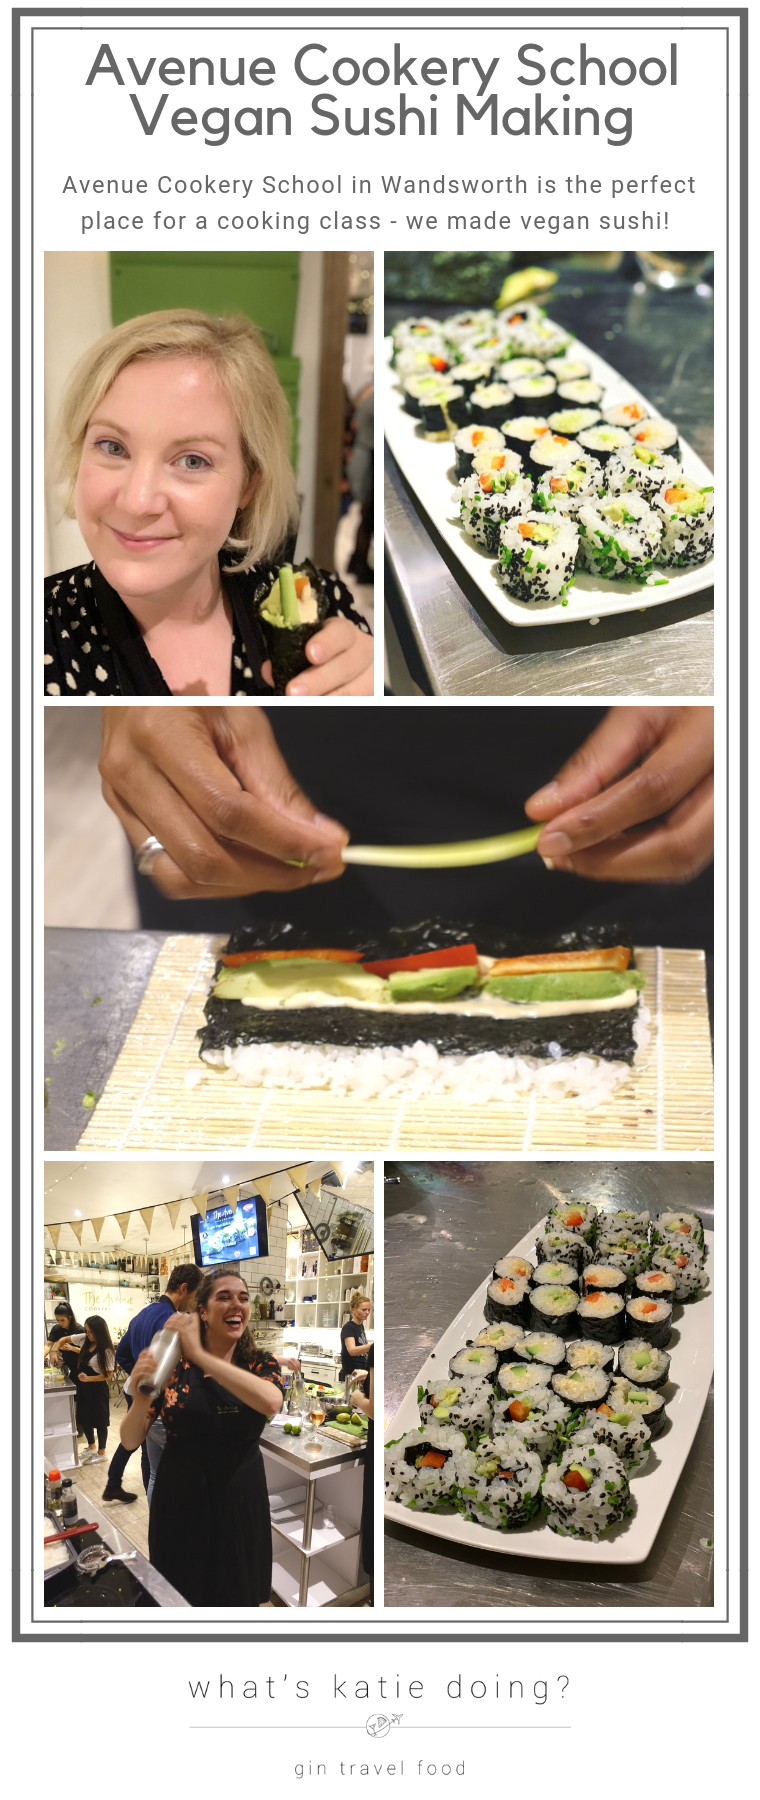 Vegan Sushi making at Avenue Cookery School in Wandsworth, London